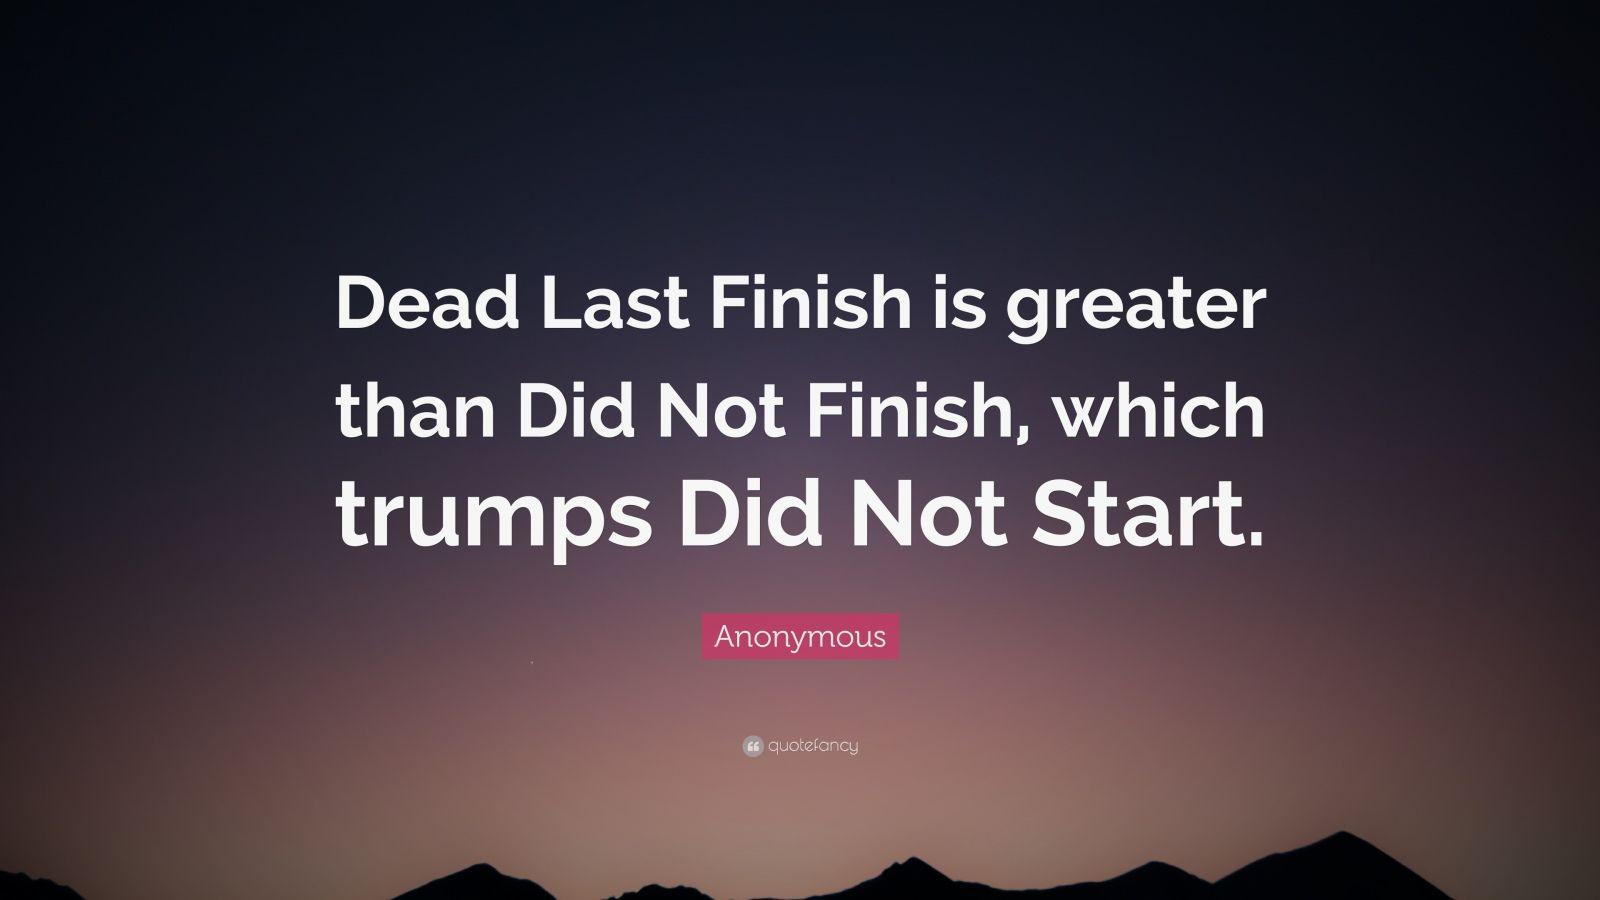 We did not finish universities